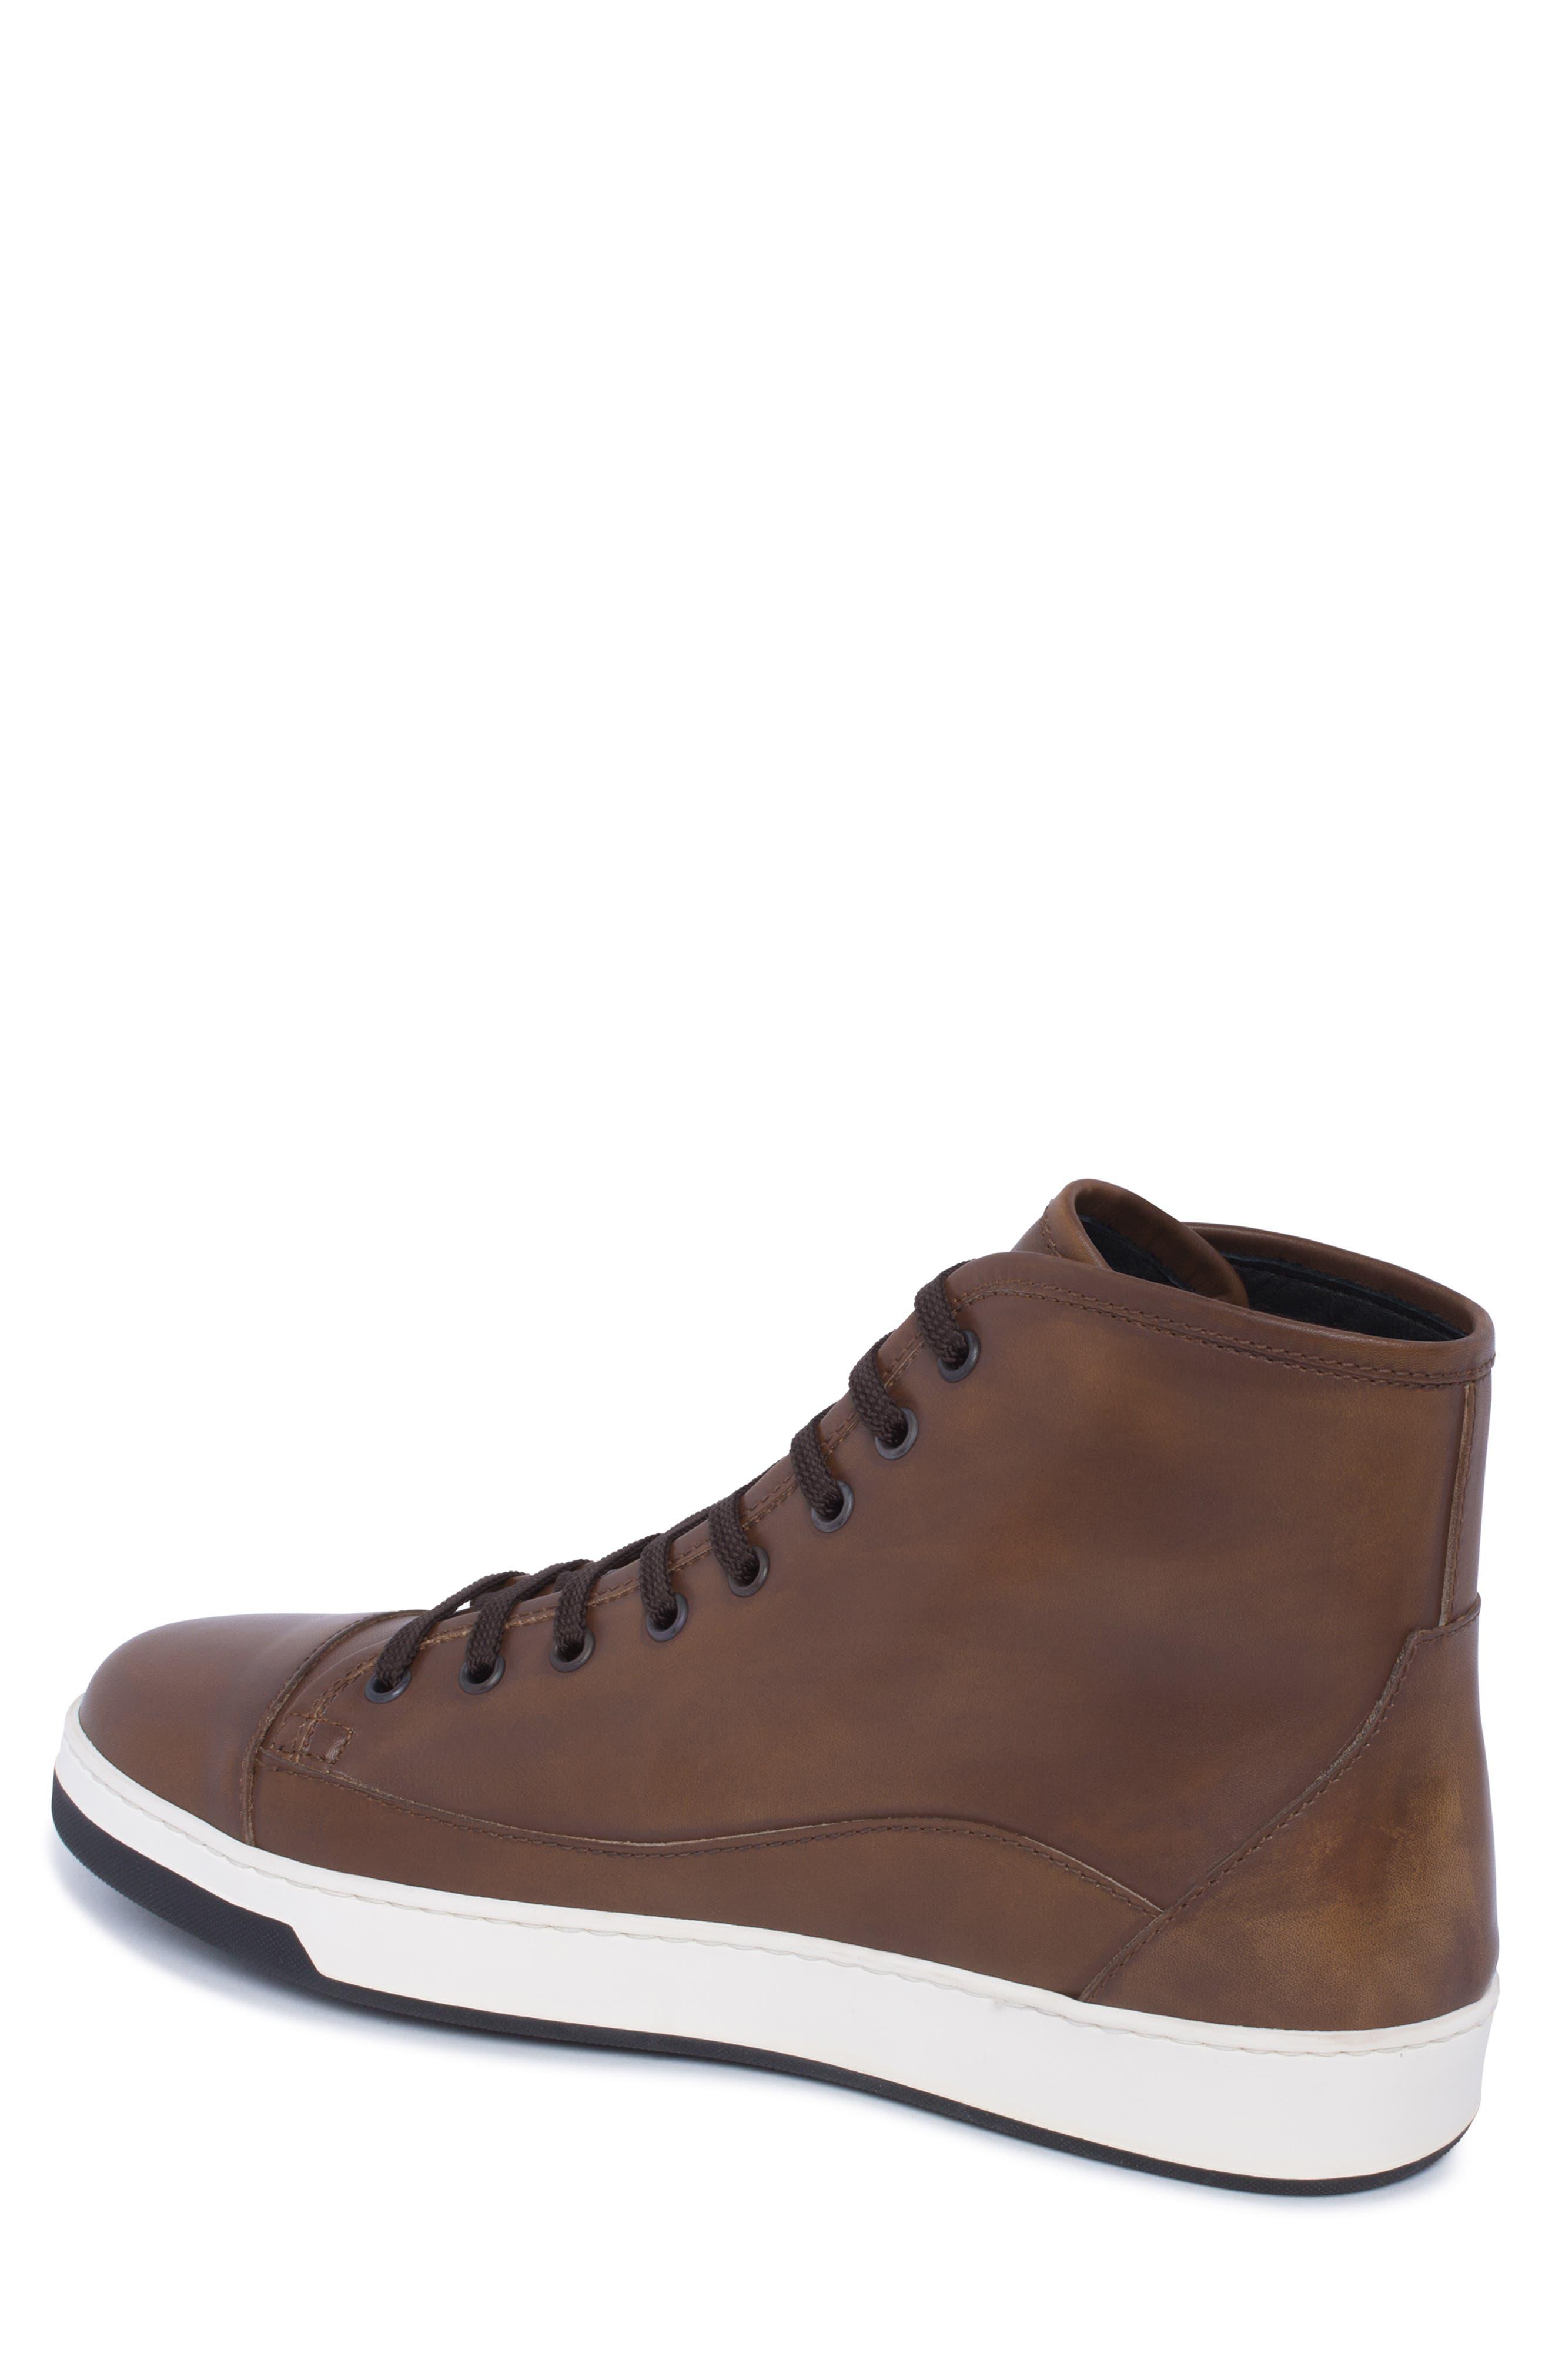 Venezia Sneaker,                             Alternate thumbnail 2, color,                             BROWN